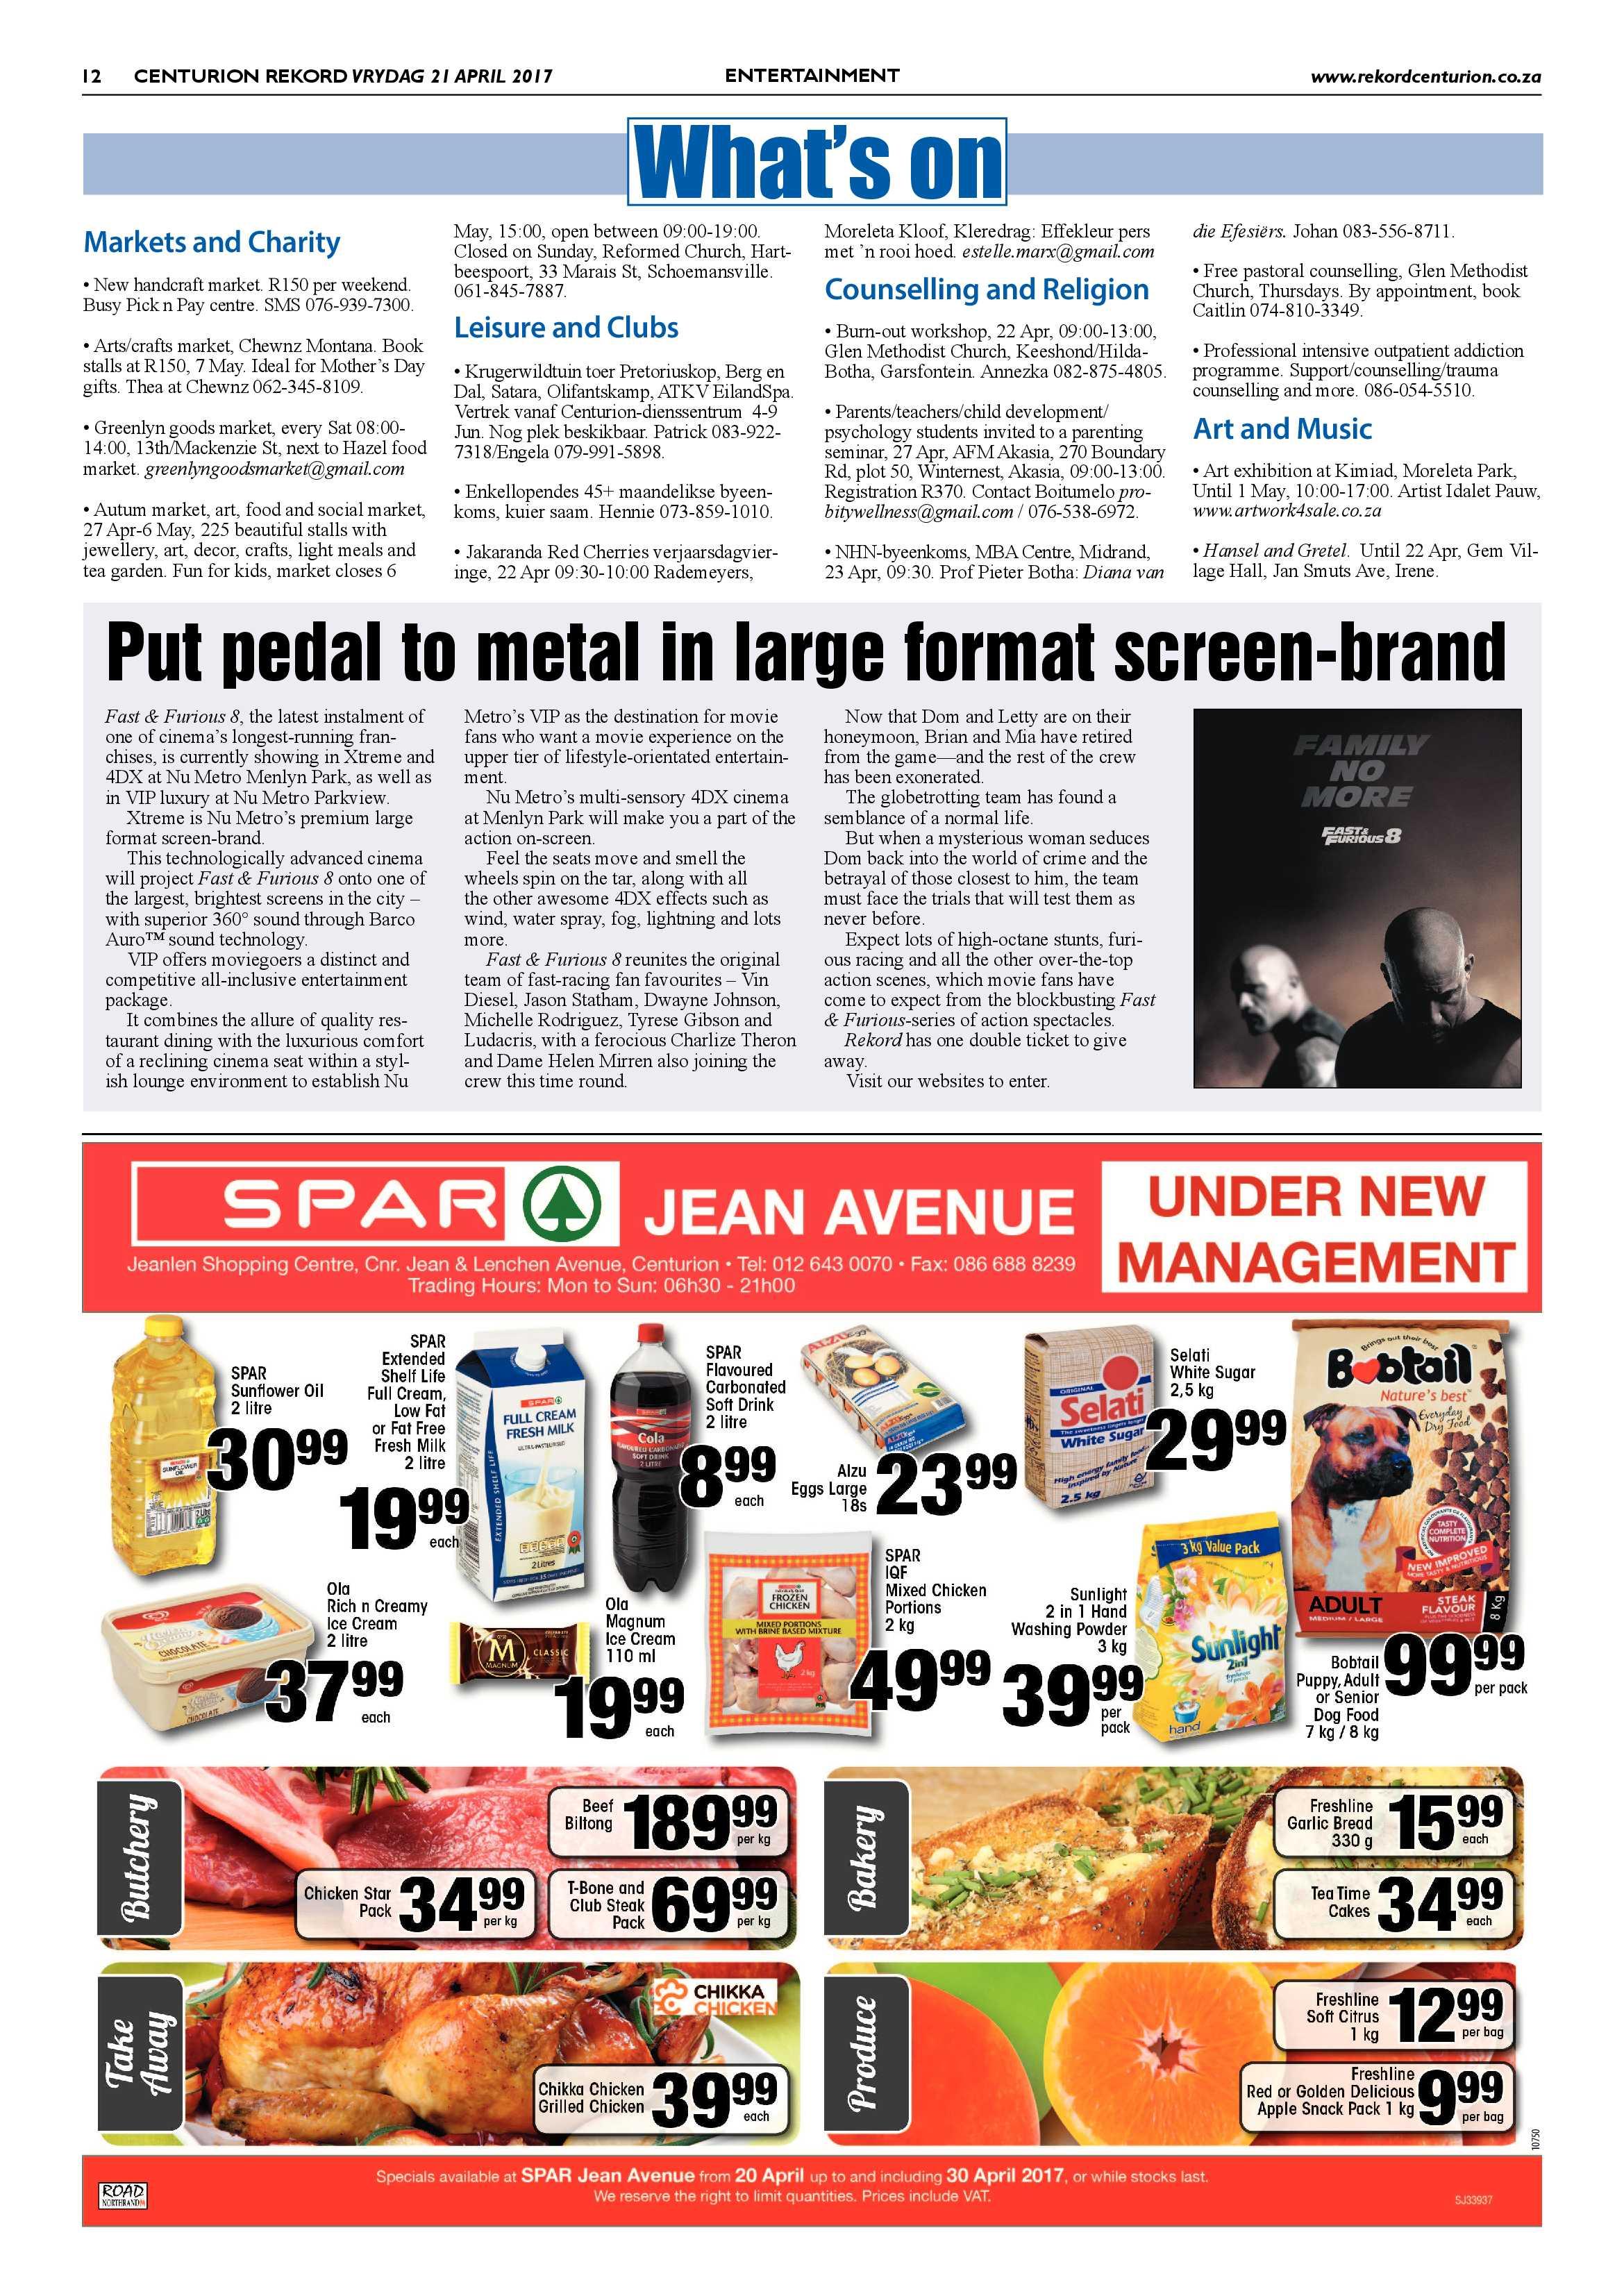 rekord-centurion-21-april-2017-epapers-page-12